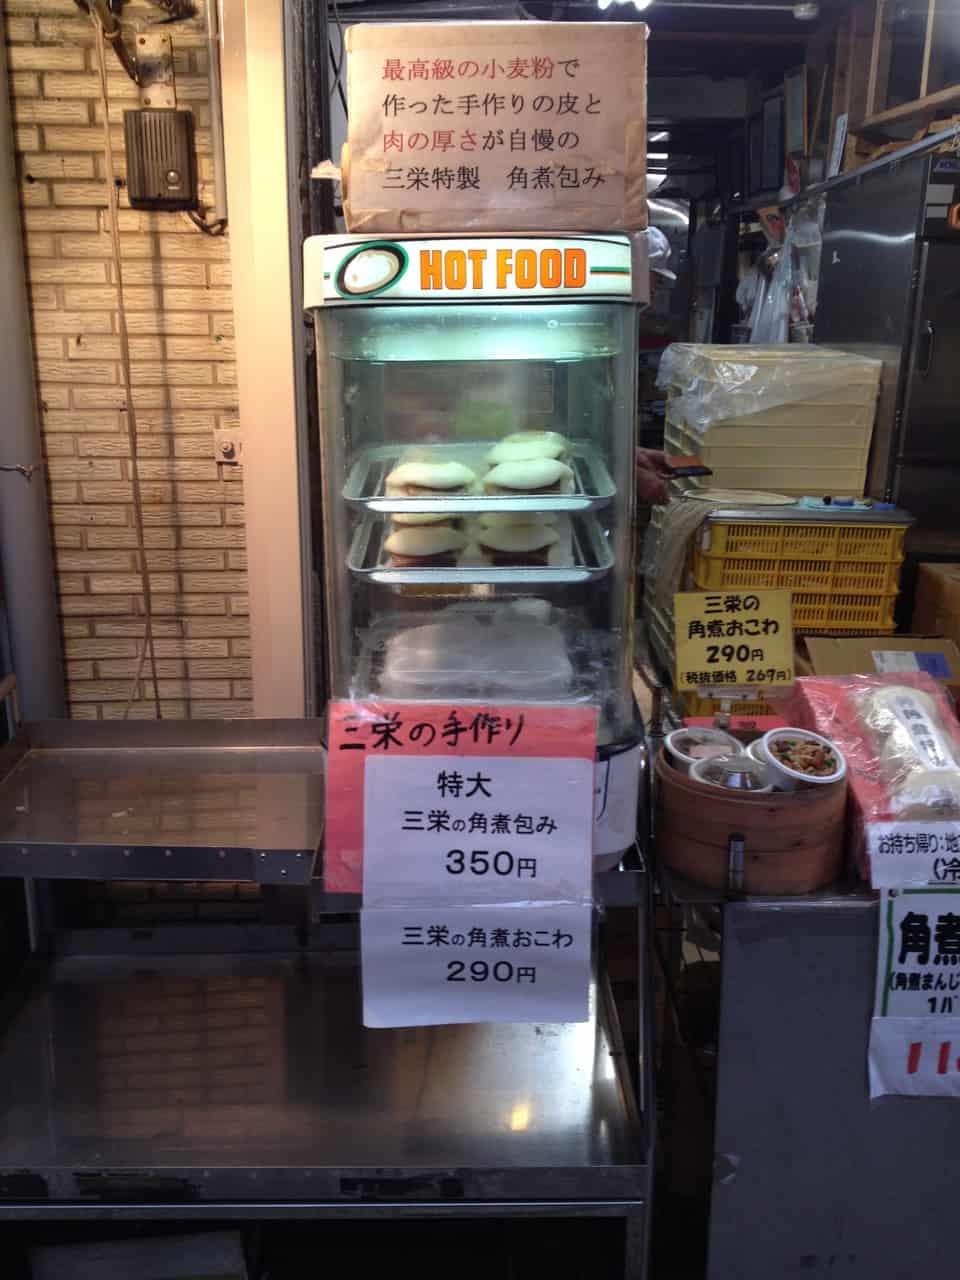 Nagasaki Chinatown Shinchi Local Food Cuisine International History Neighborhood Restaurant